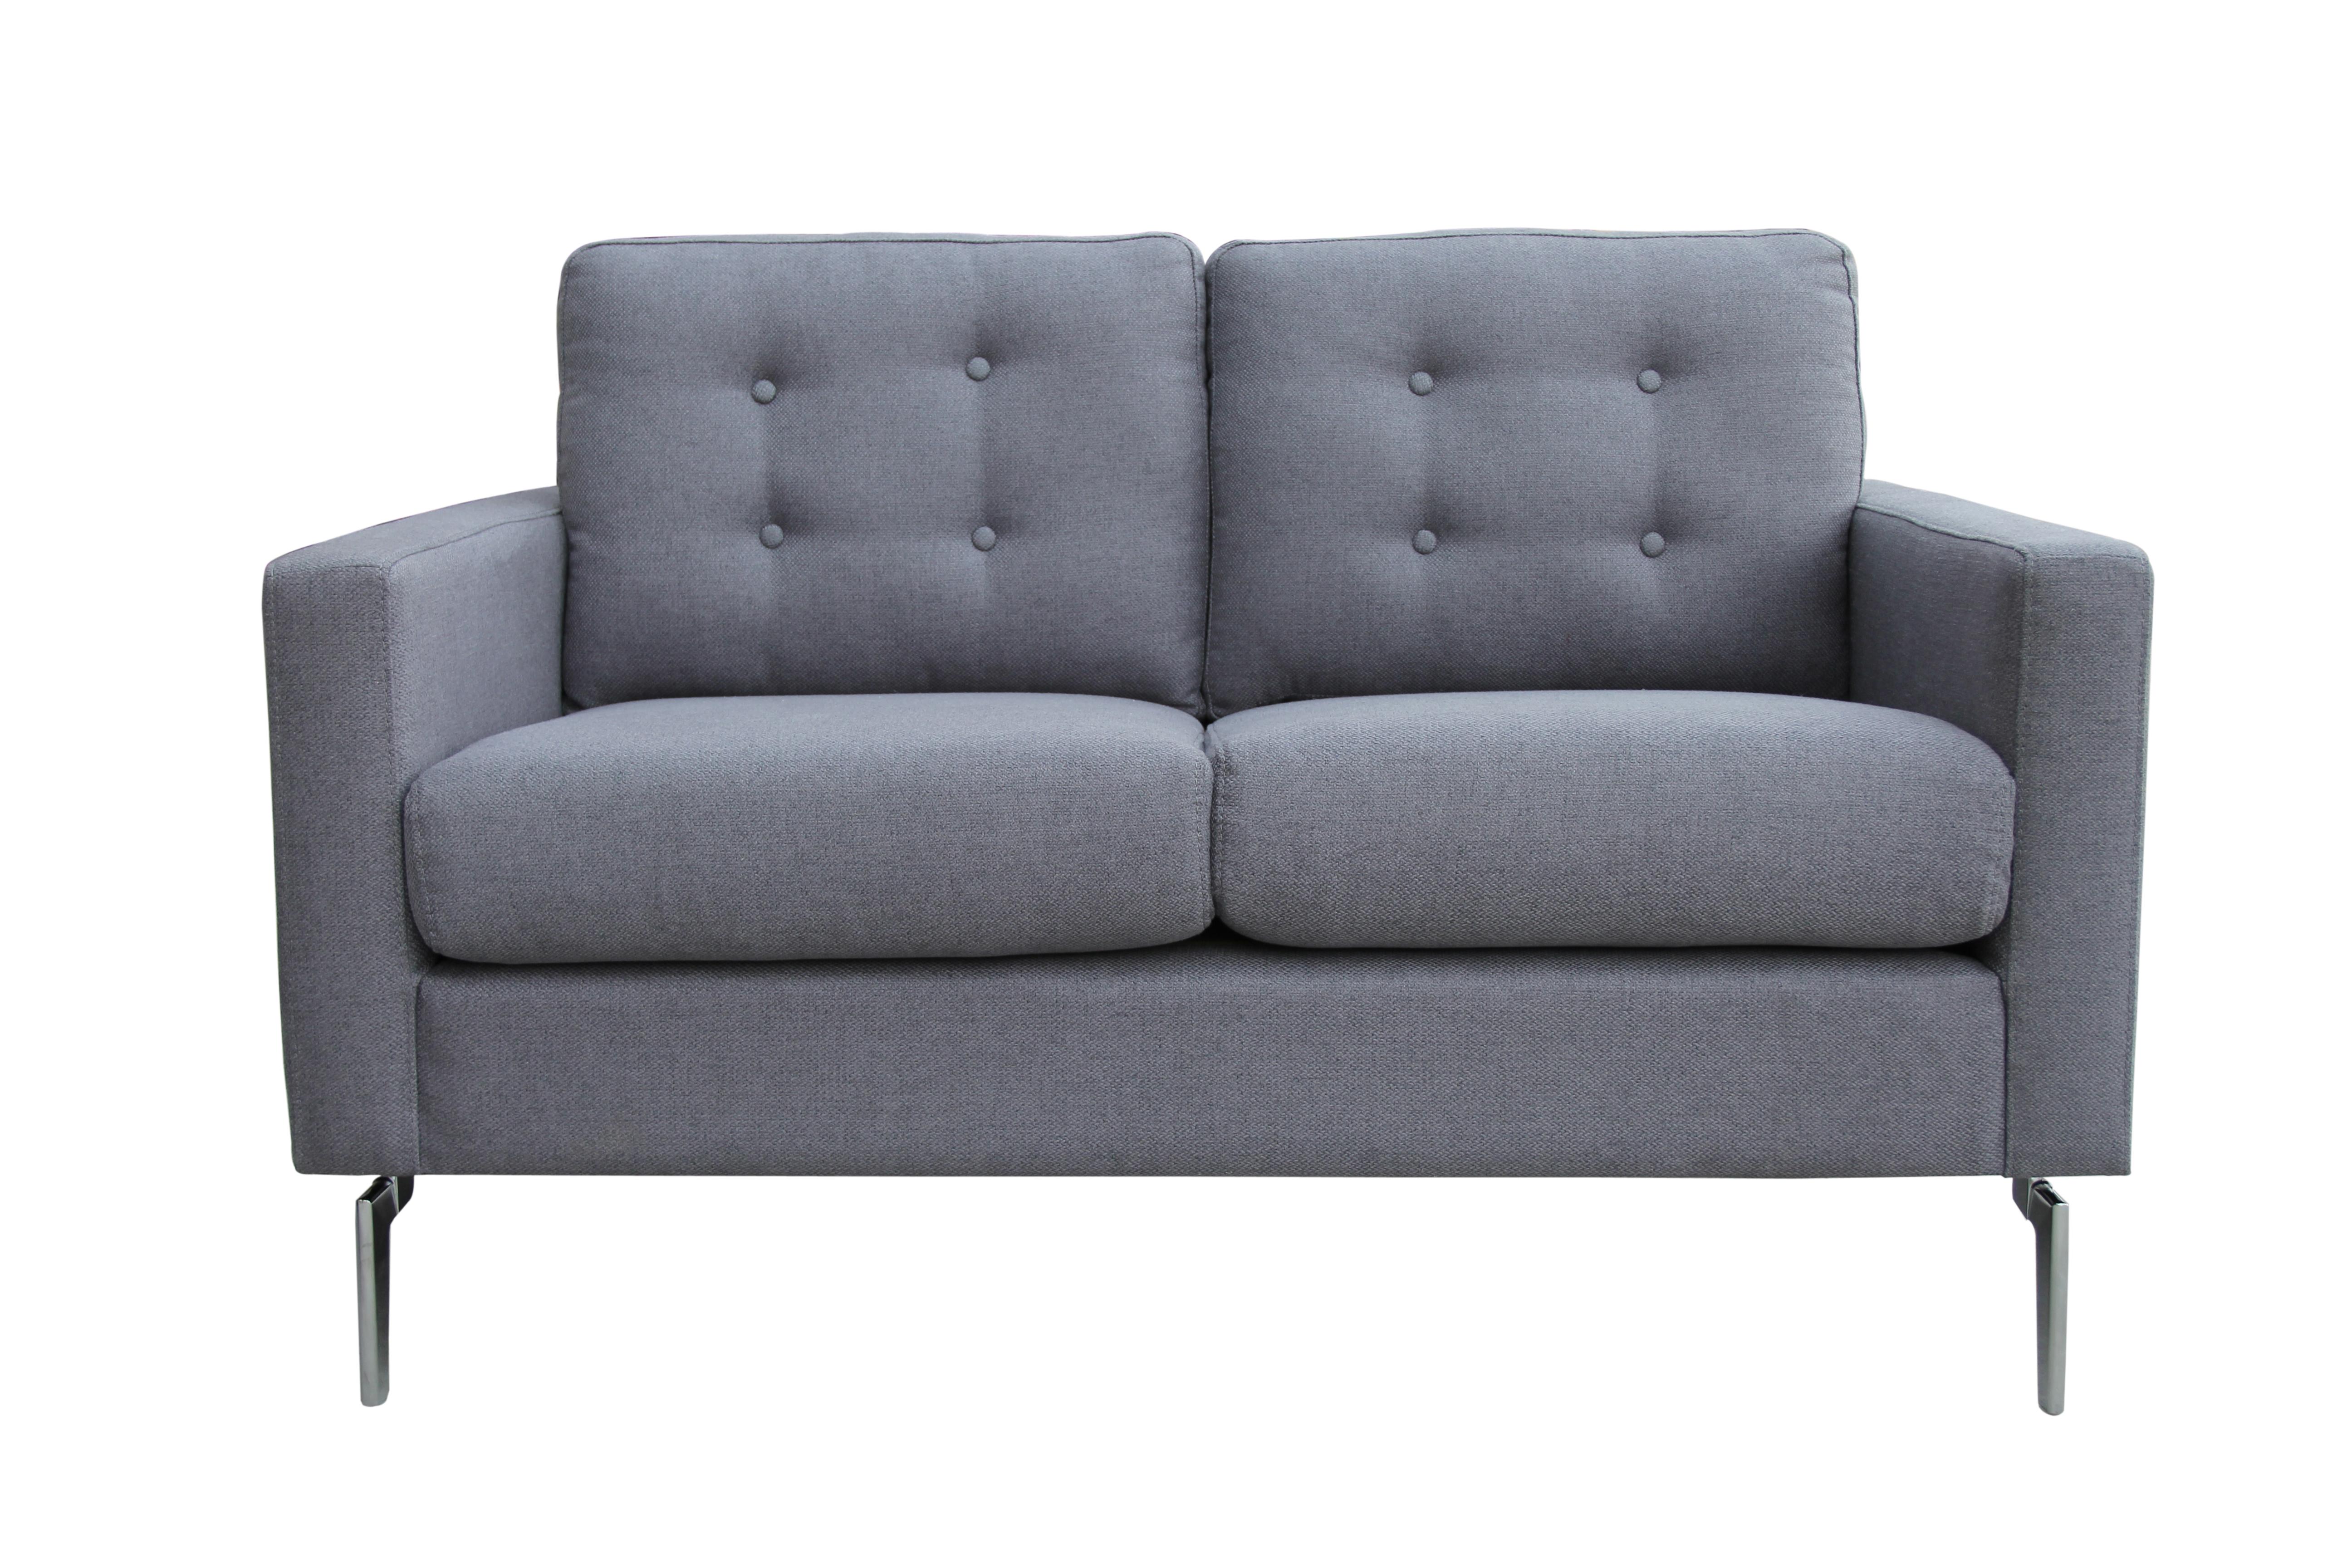 Canapea fixa 2 locuri Eliza Grey